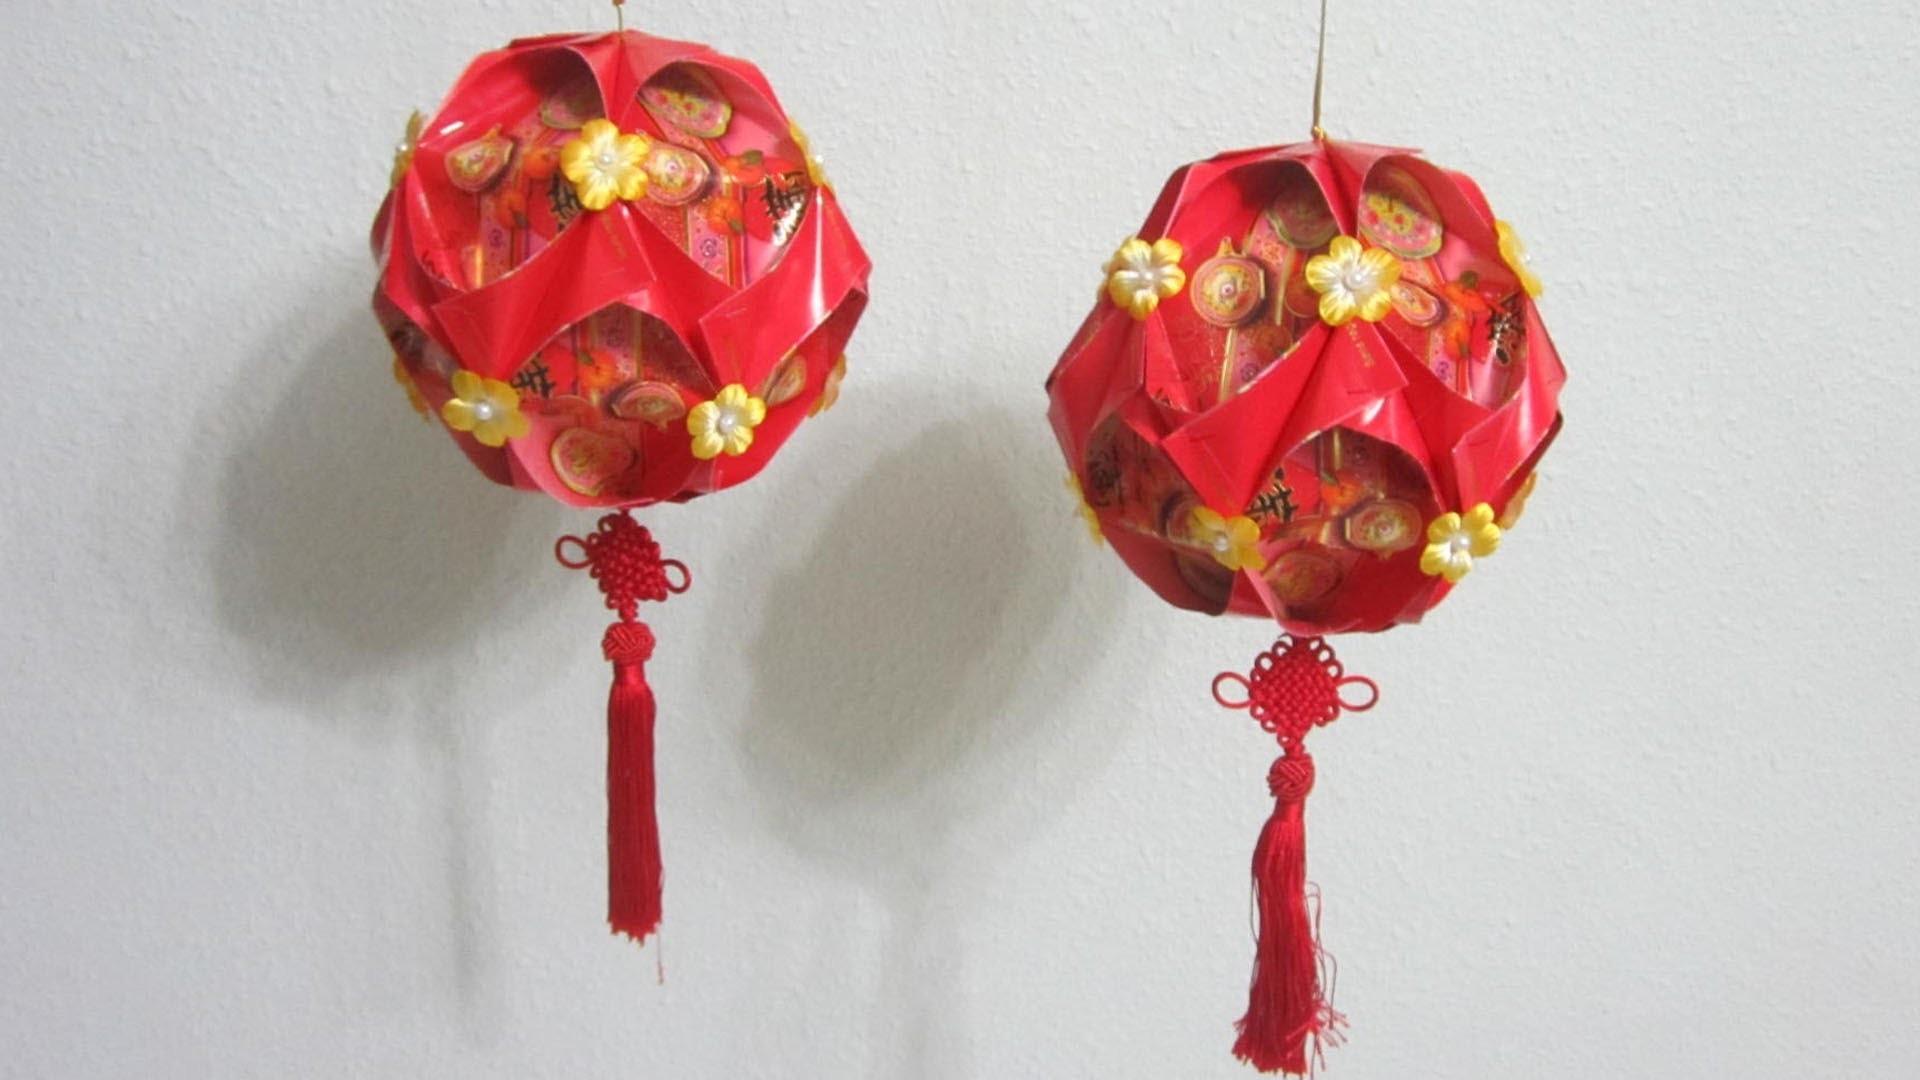 CNY TUTORIAL 2 - Chinese New Year Lantern